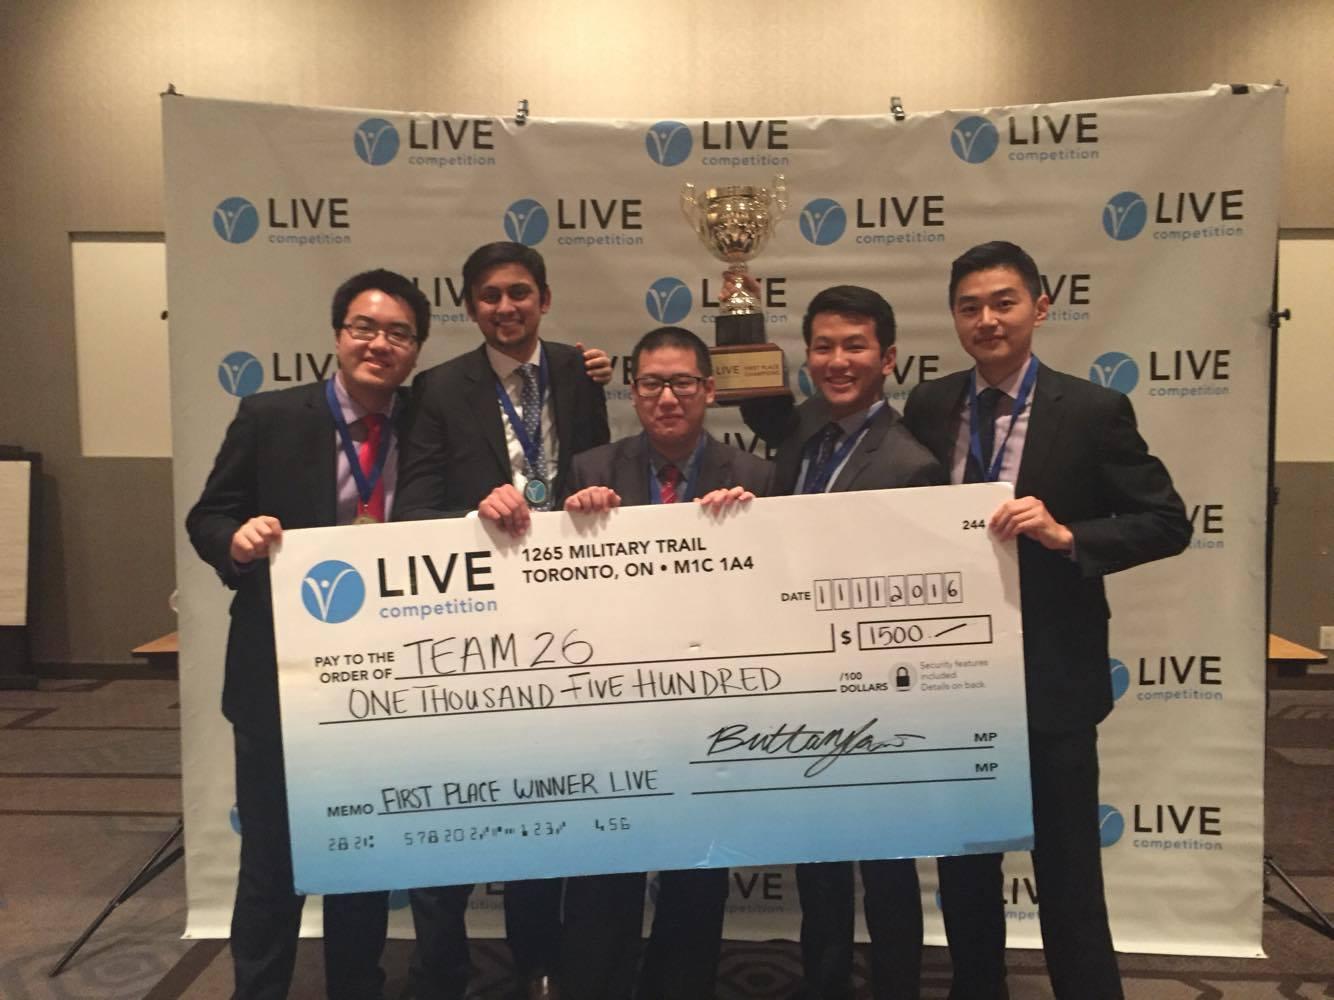 Edison Cheung (AFM), Hasanain Habib-Nayany (AFM), David Zhang (AFM), Arthur Huang (AFM), Angus Cao (AFM) holding $1500 prize